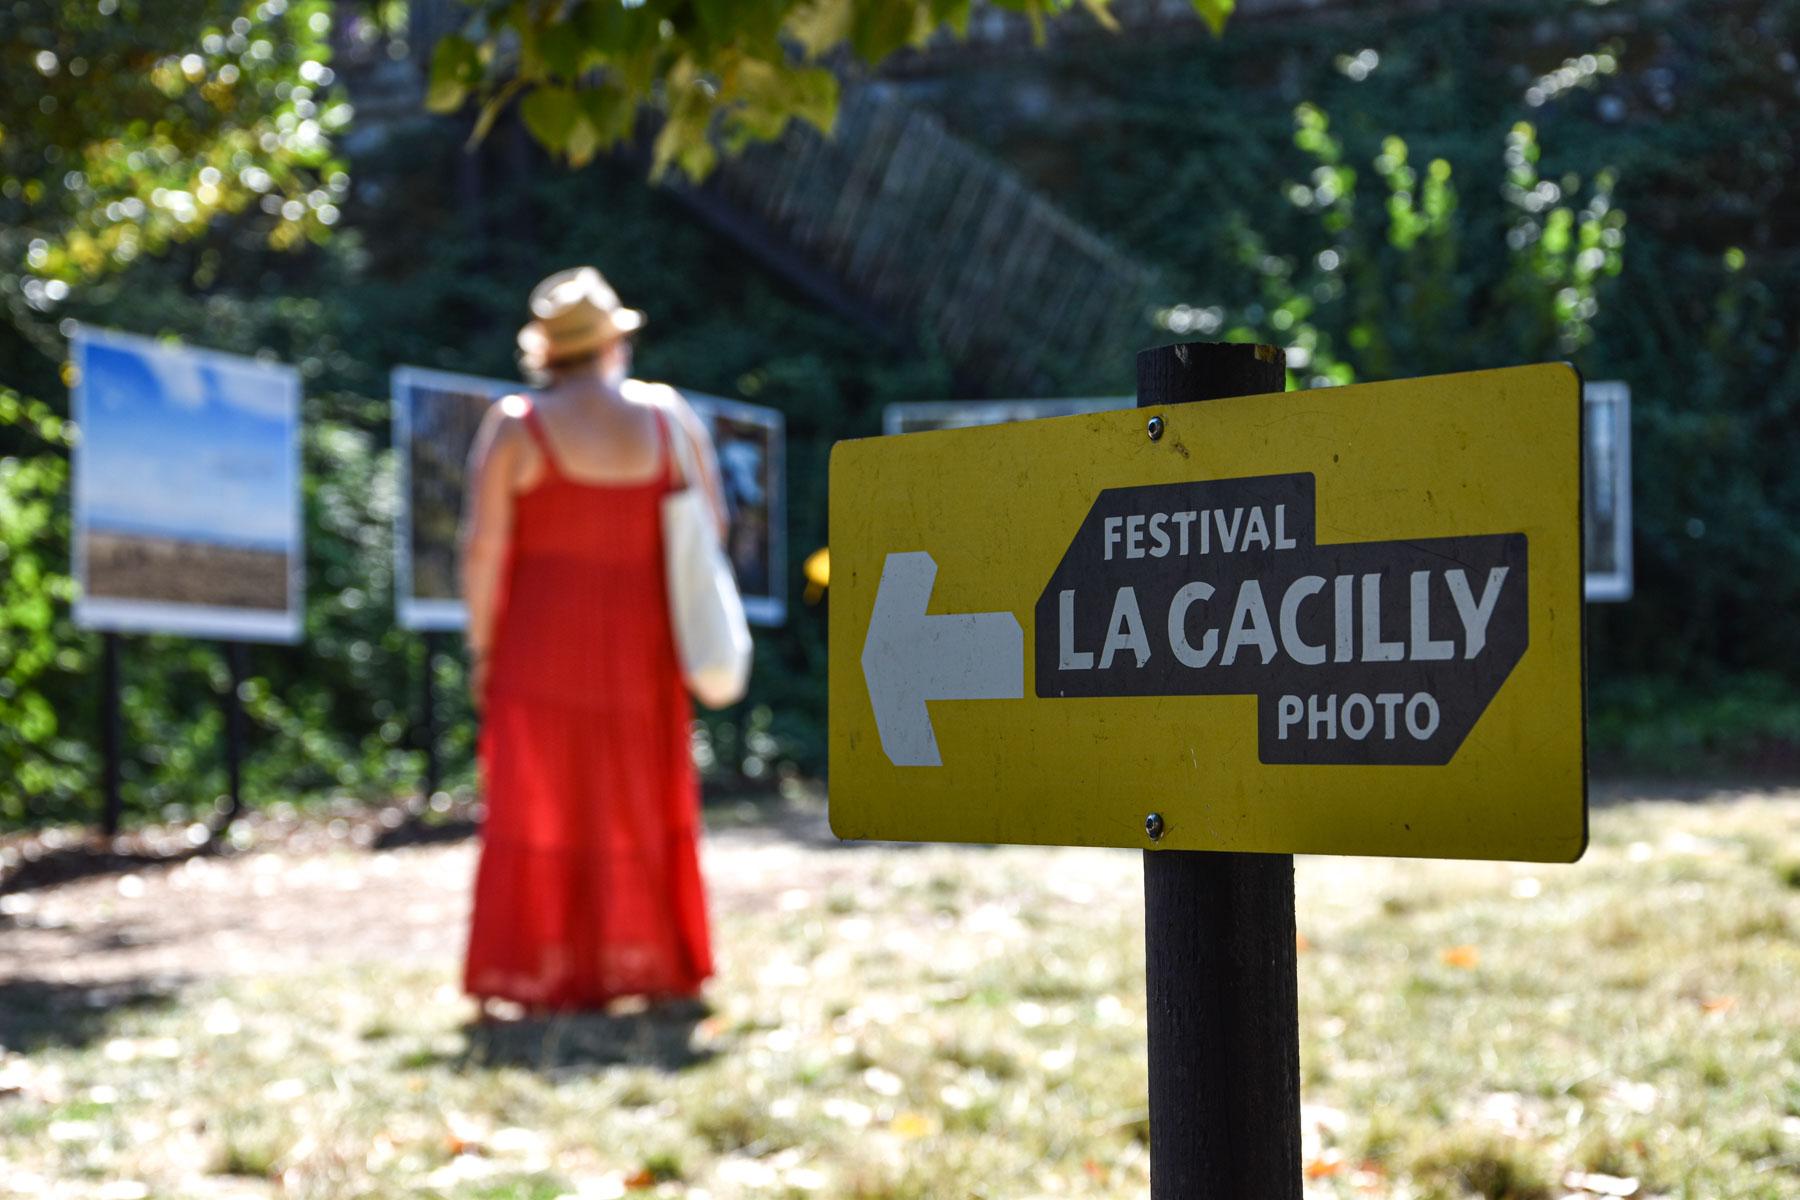 Festival photo, La Gacilly, Morbihan, Bretagne